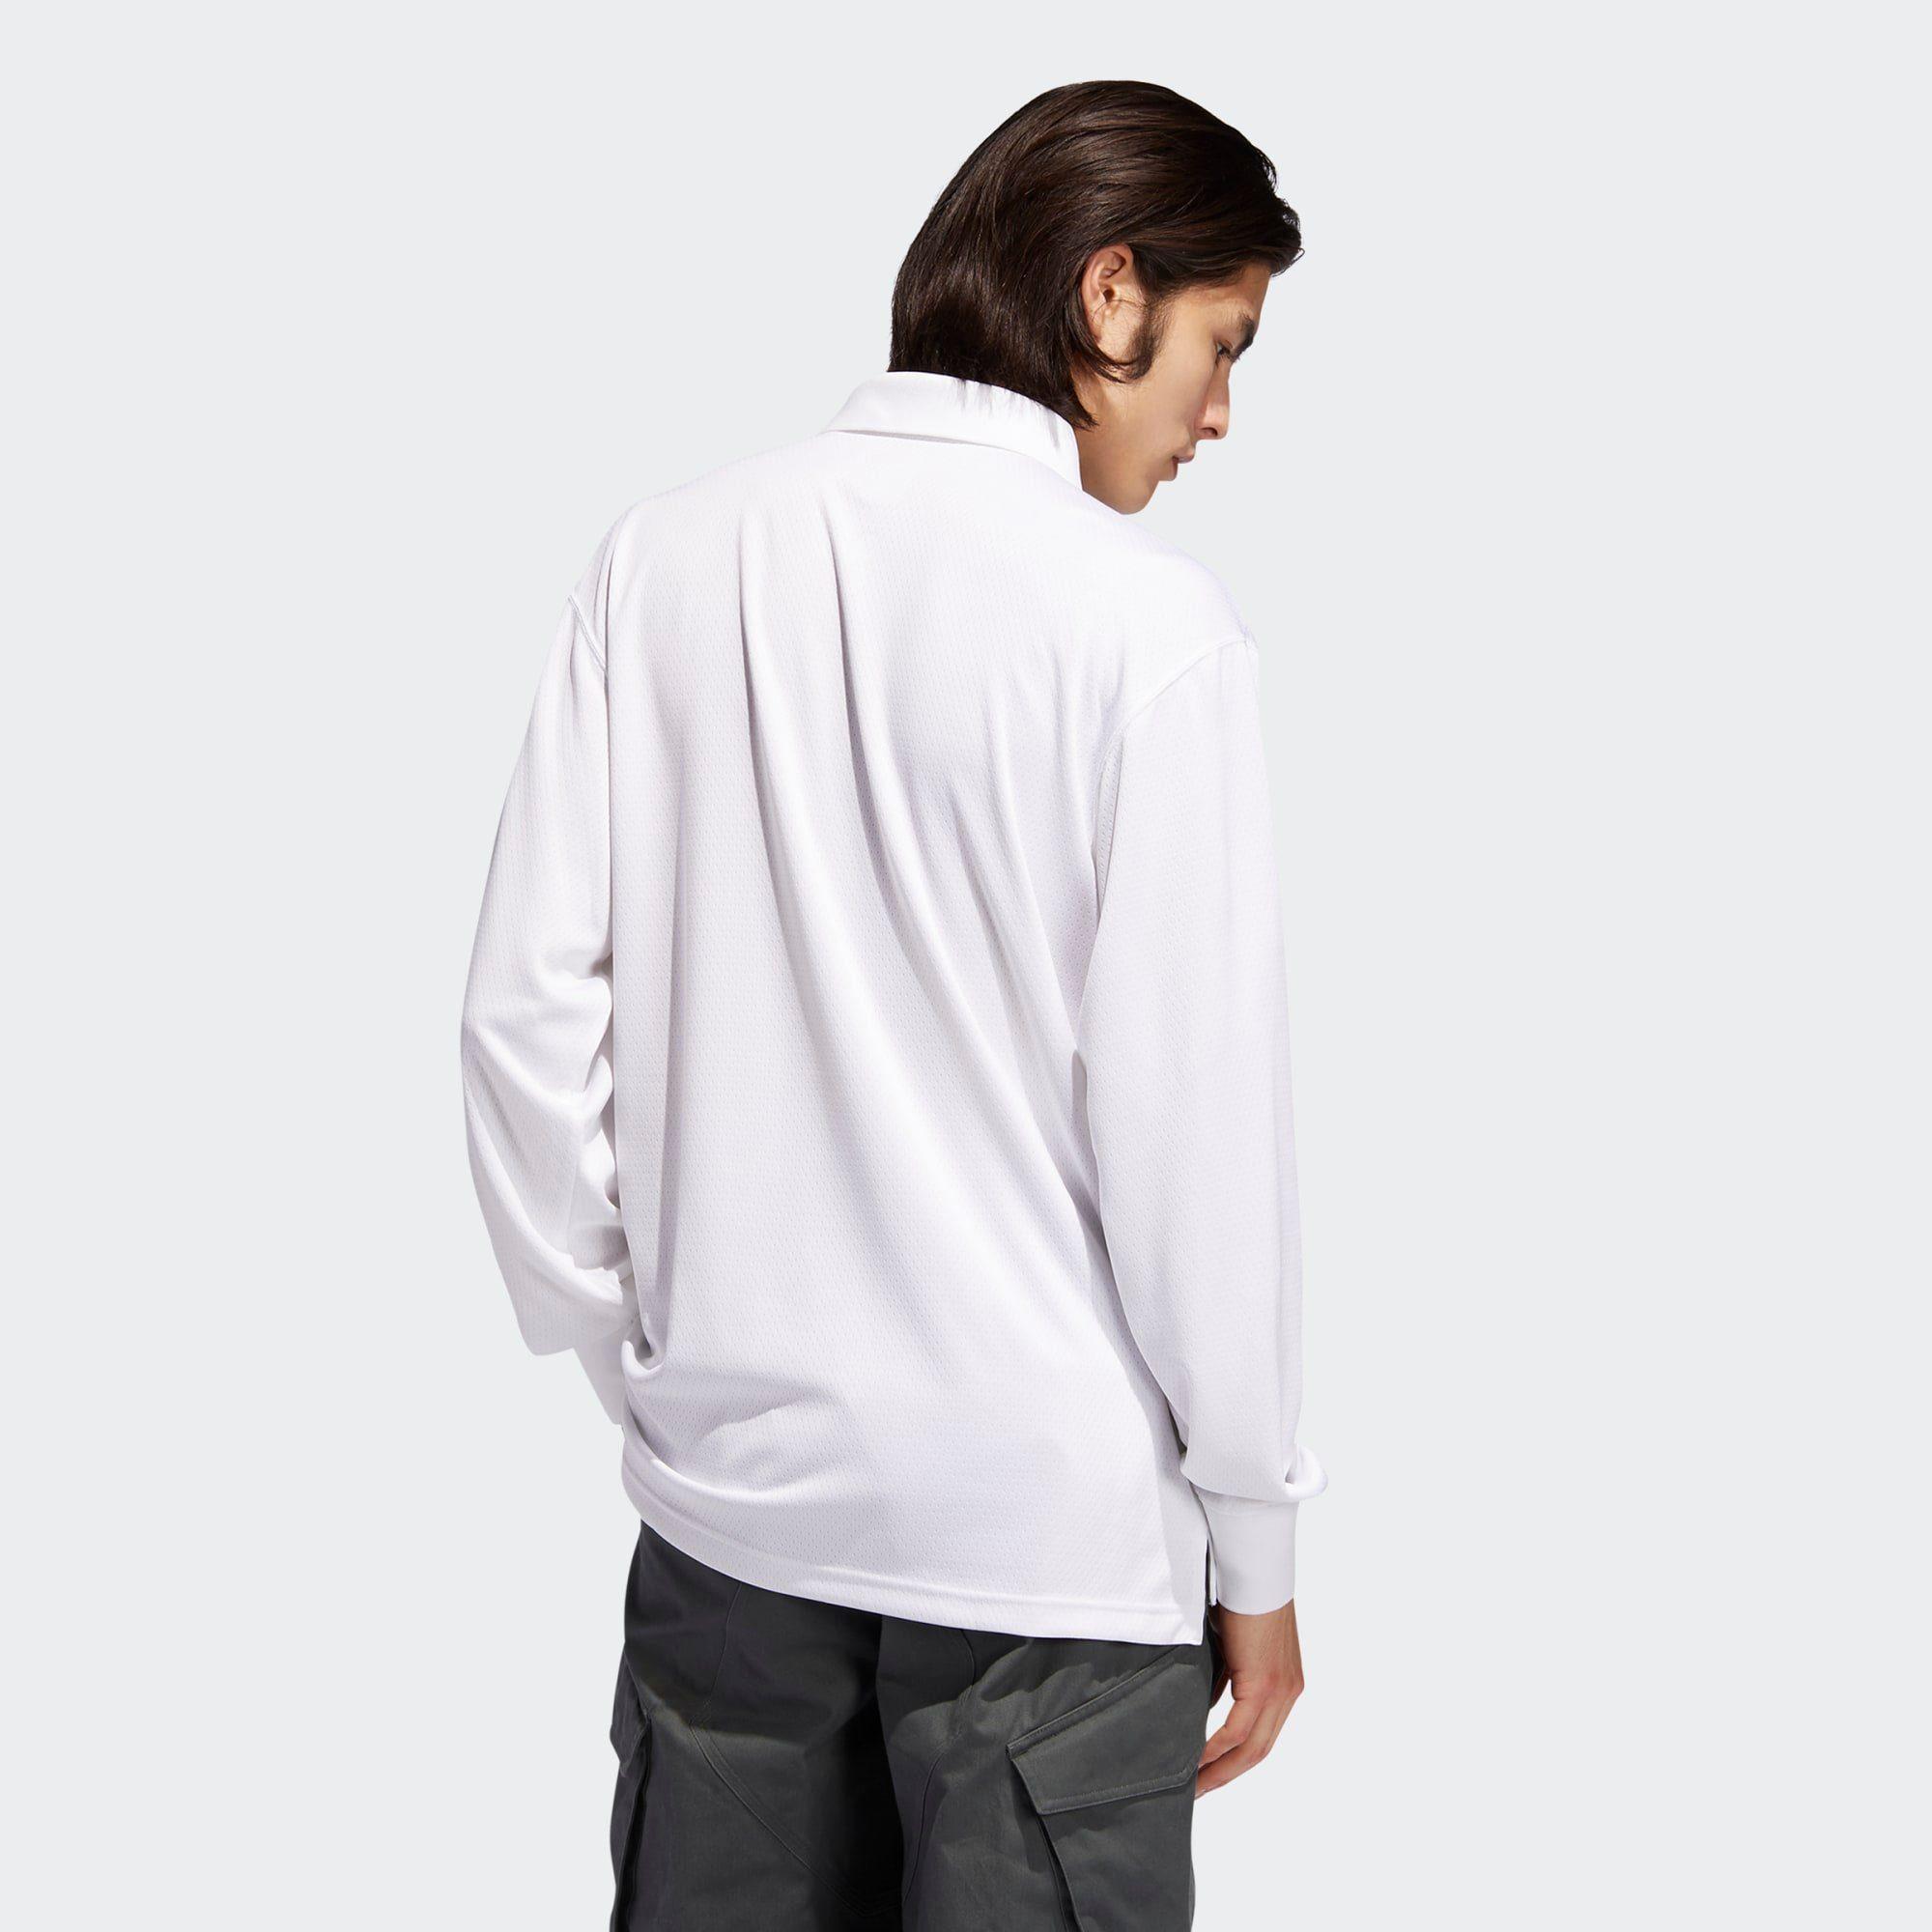 adidas Originals Langarmshirt Elevated Rugby Long-sleeve Top online kaufen W25LOy